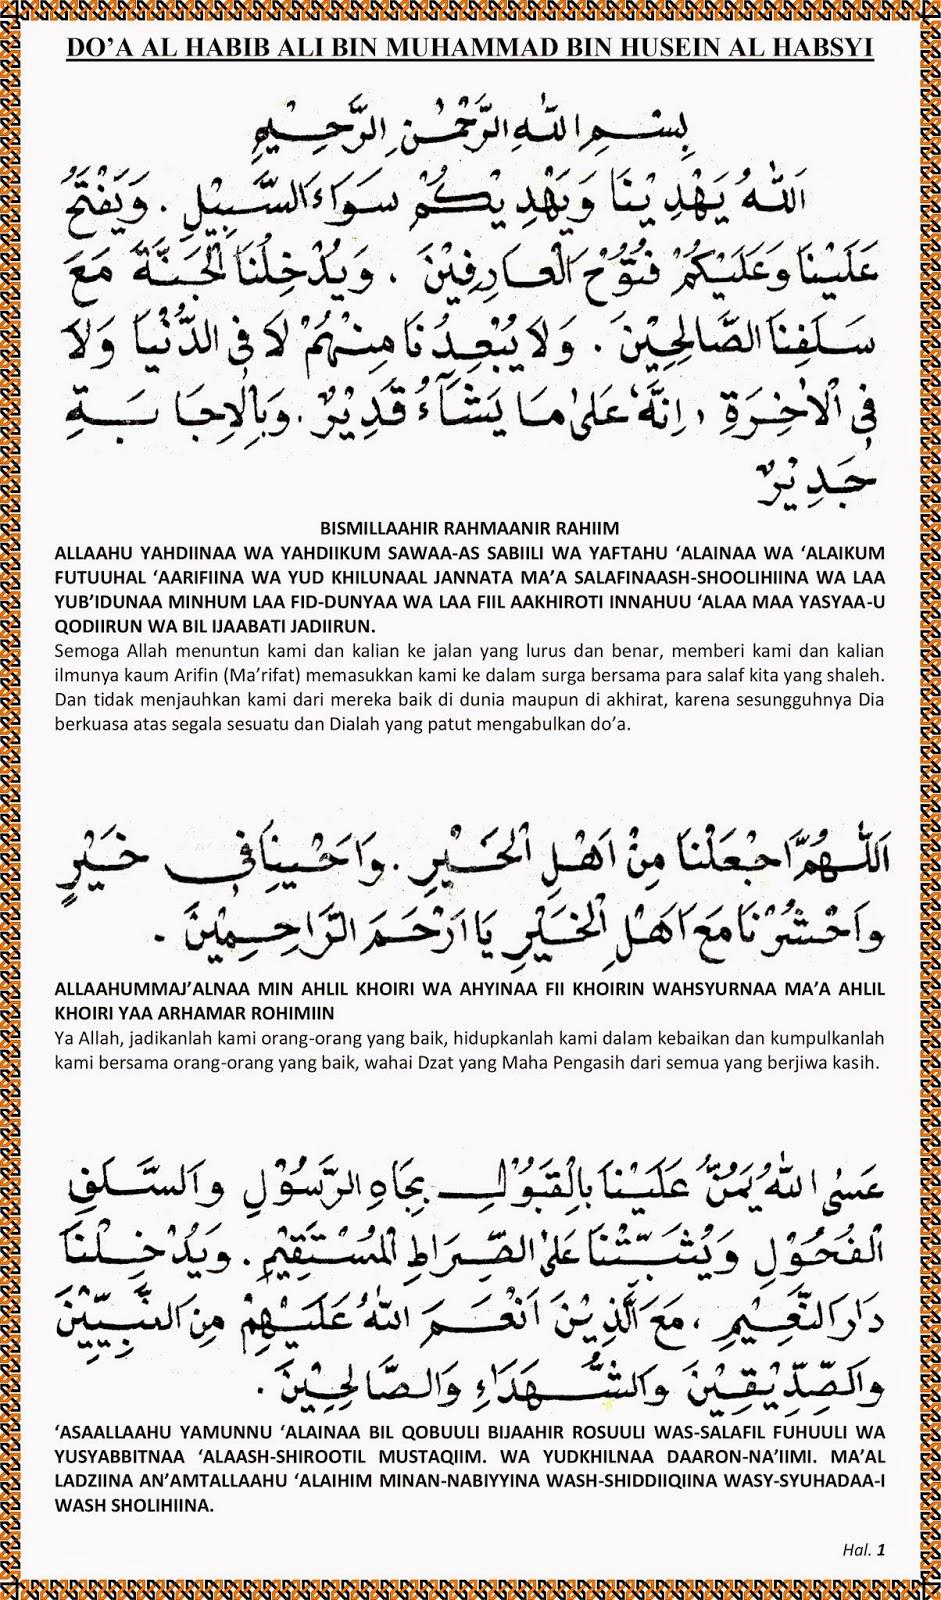 Doa Al Habib Ali Bin Muhammad Bin Husein Al Habsyi 2 Majelis Ta